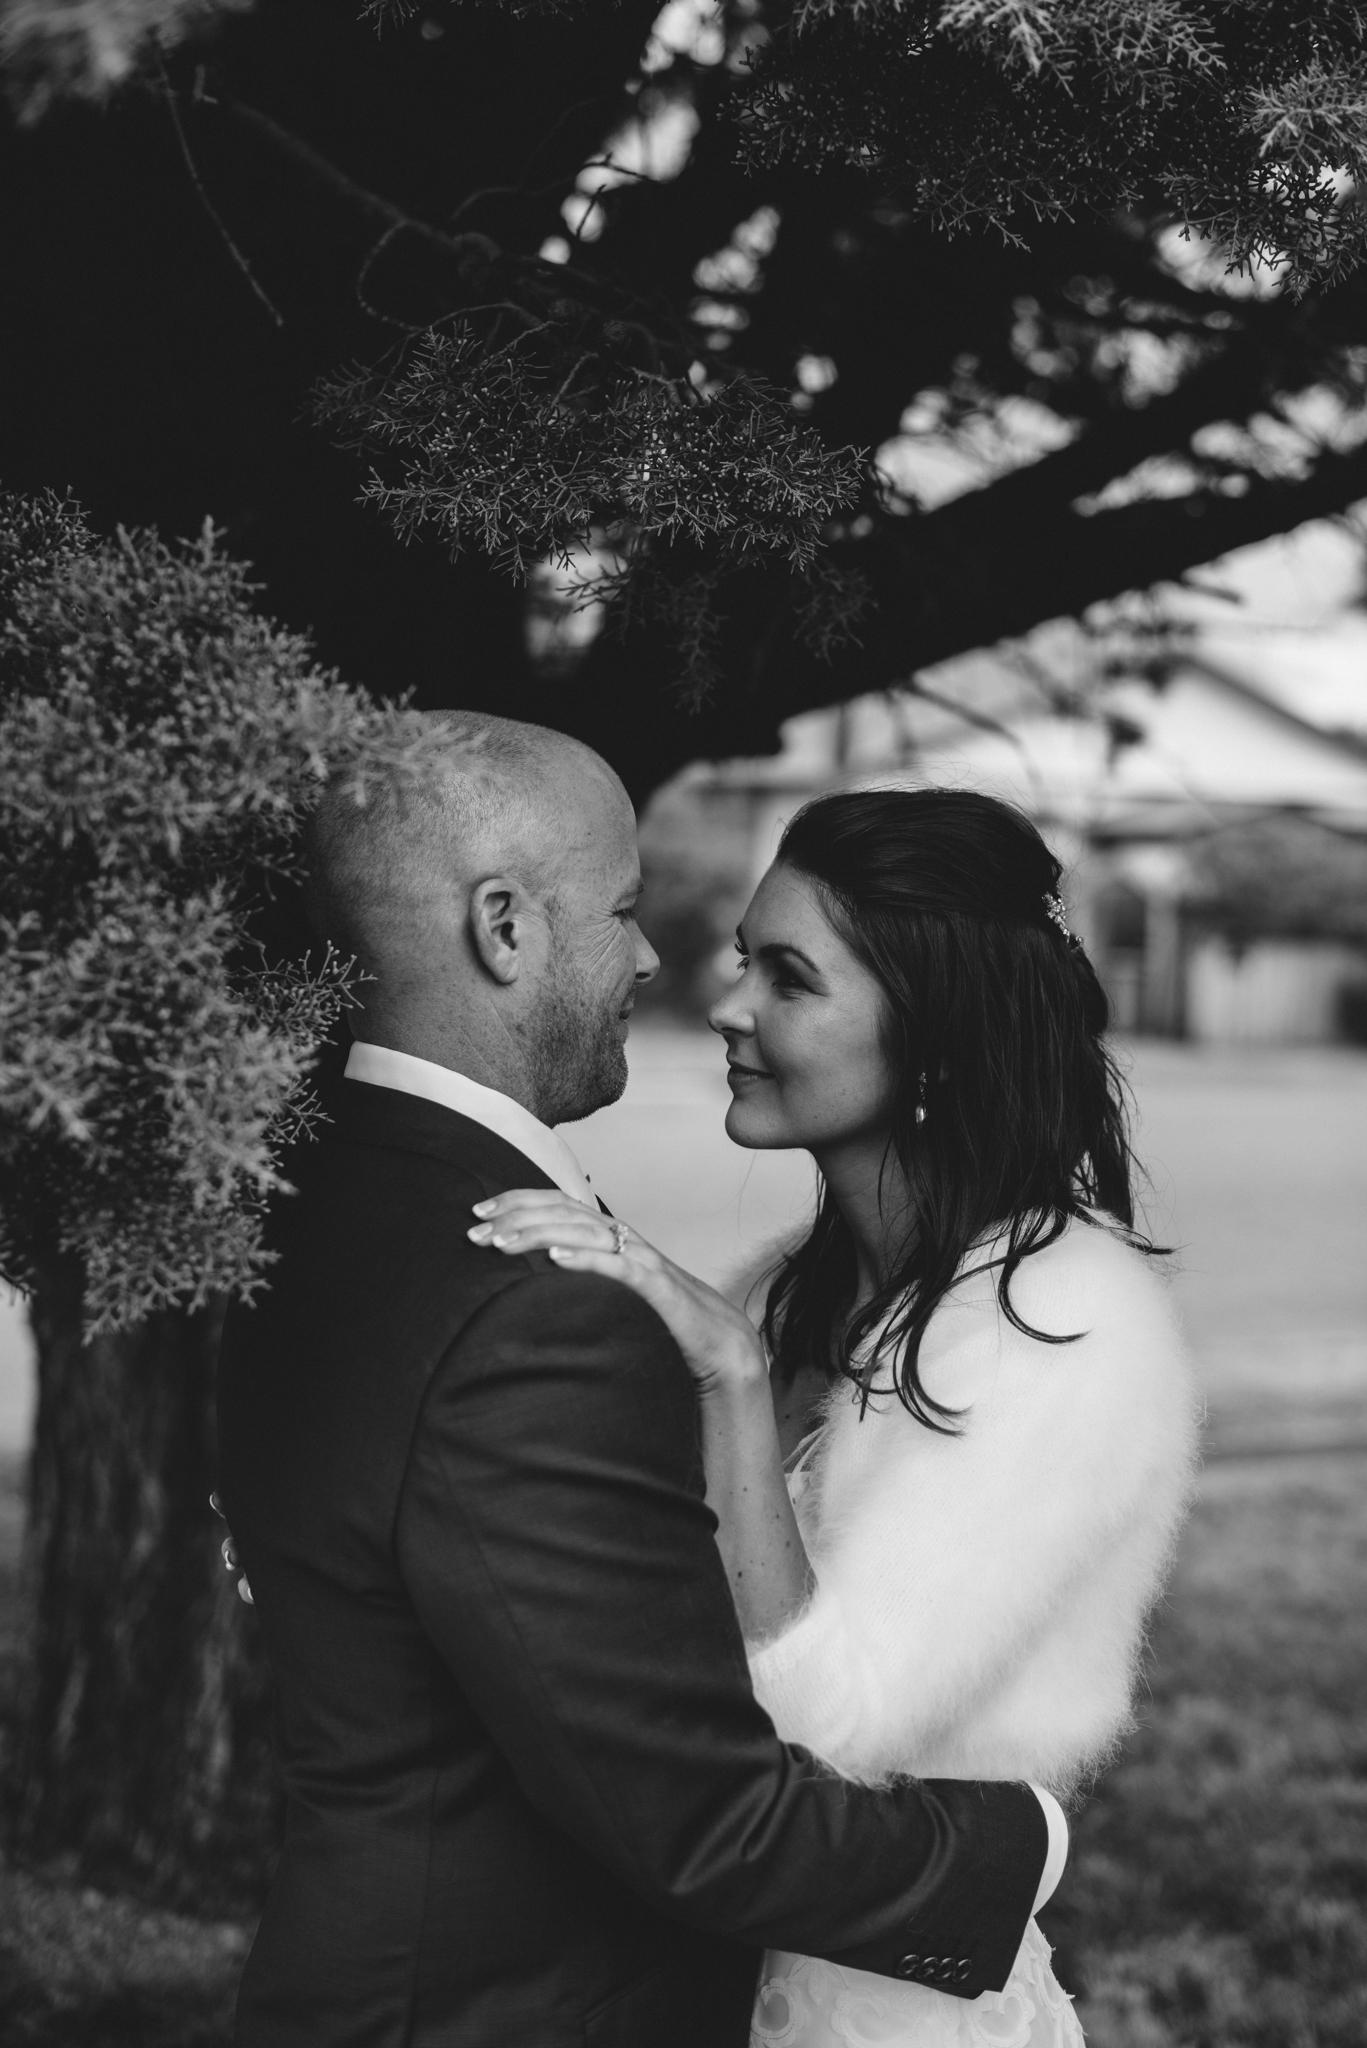 LOVELENSCAPES PHOTOGRAPHY • VISUAL POETRY • NEW ZEALAND WEDDING PHOTOGRAPHER • AUSTRALIAN WEDDING PHOTOGRAPHER • BRISBANE • MELBOURNE • SYDNEY • HOBART • TARUREKA ESTATE • ANNA CAMPBELL • 151.jpg